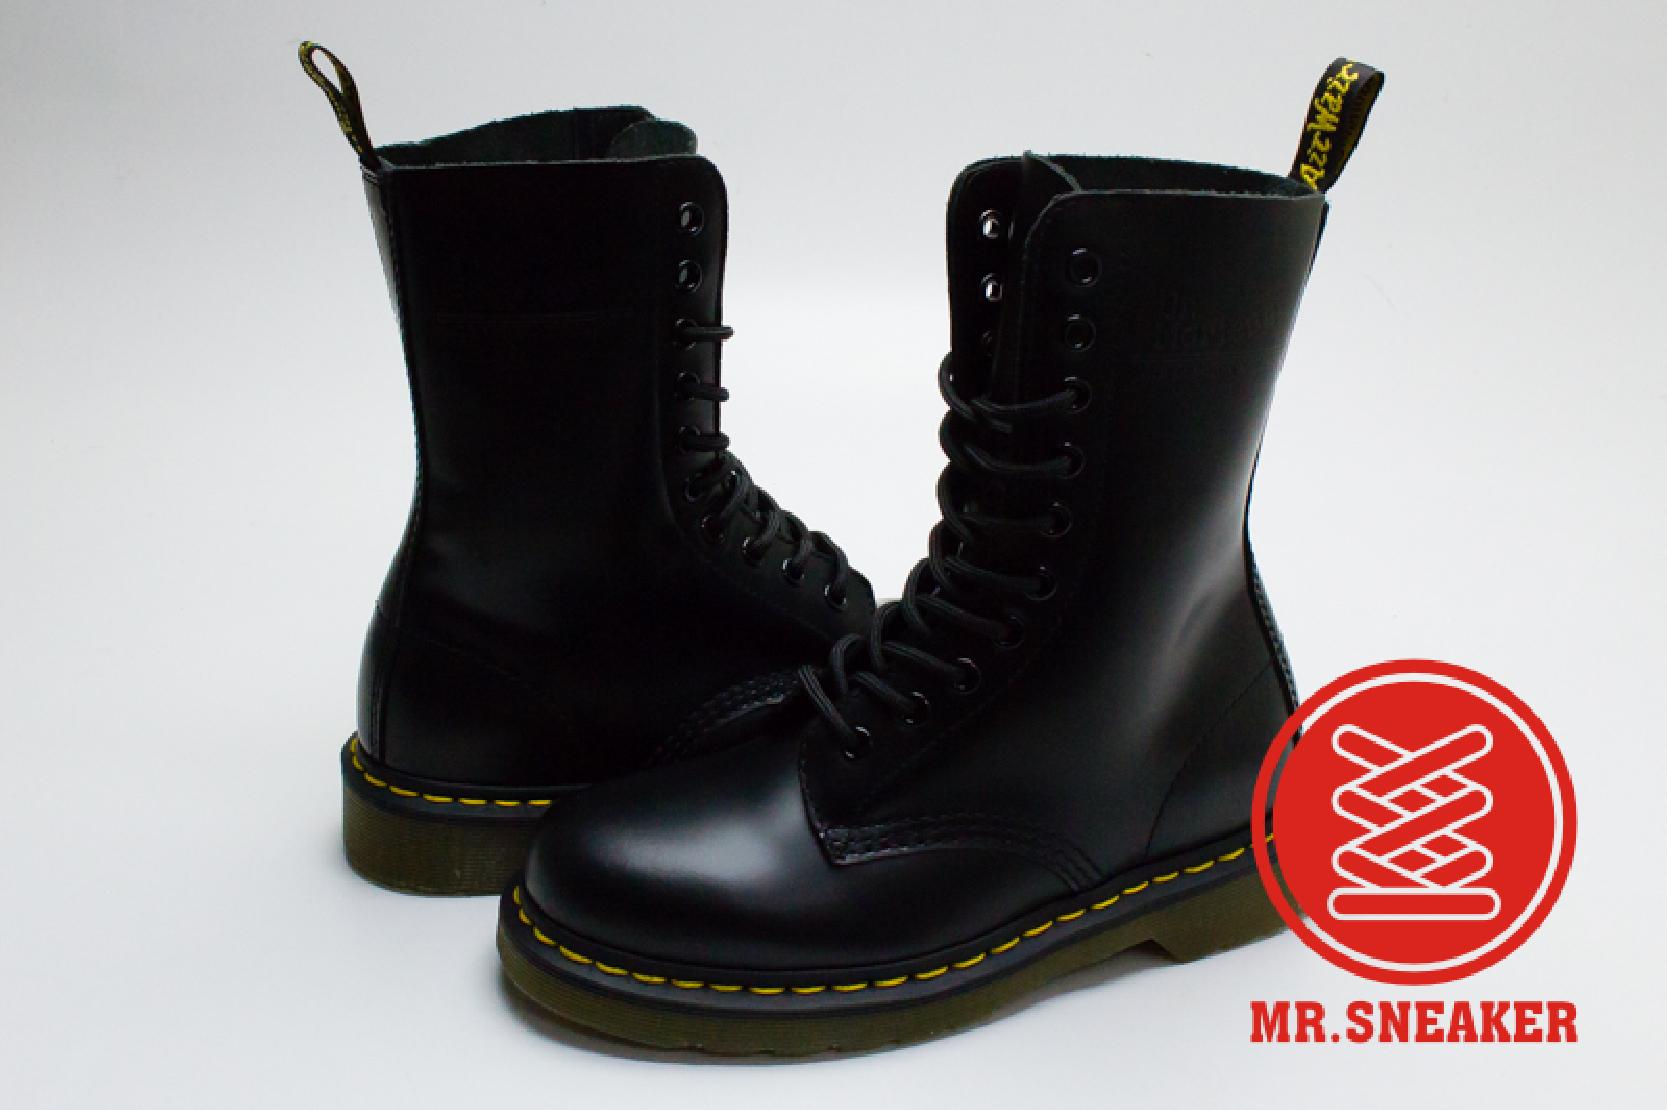 ☆Mr.Sneaker☆ Dr.Martens 1490 10孔 馬汀 靴子 經典 百搭 硬皮 黑色 台灣公司貨 女段